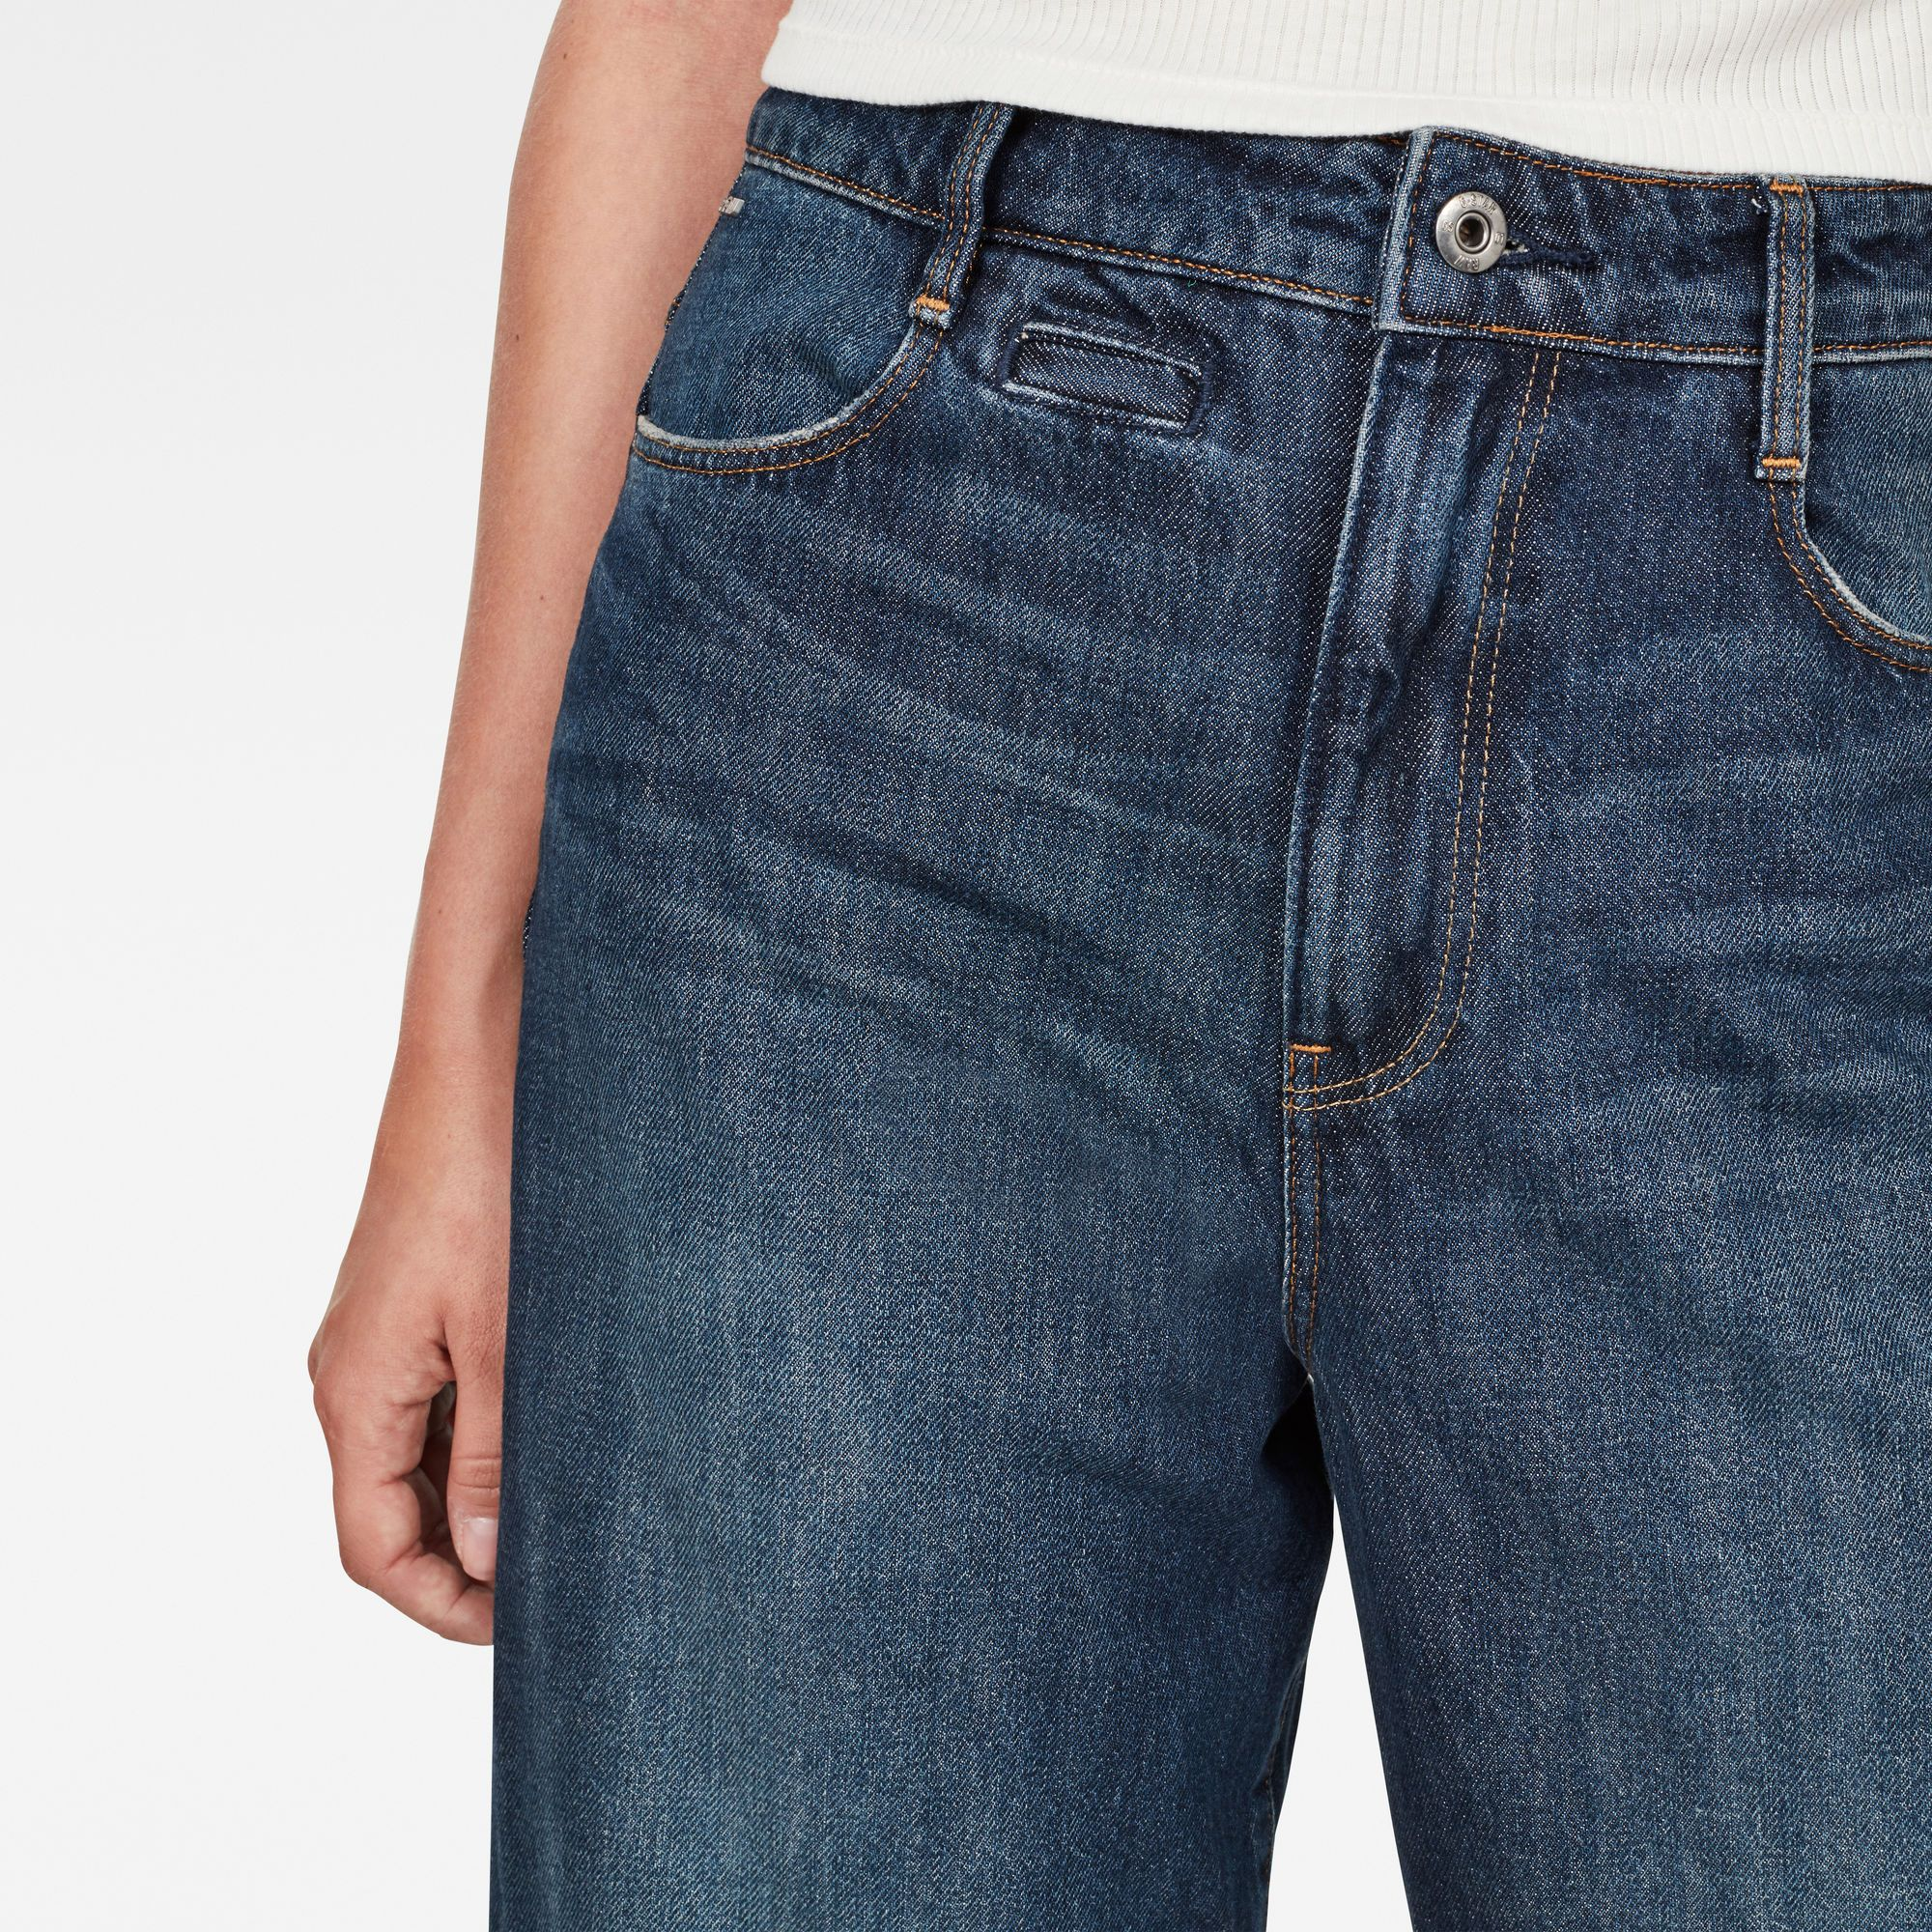 G-Star RAW D-Staq 5-Pocket High Waist Jeans